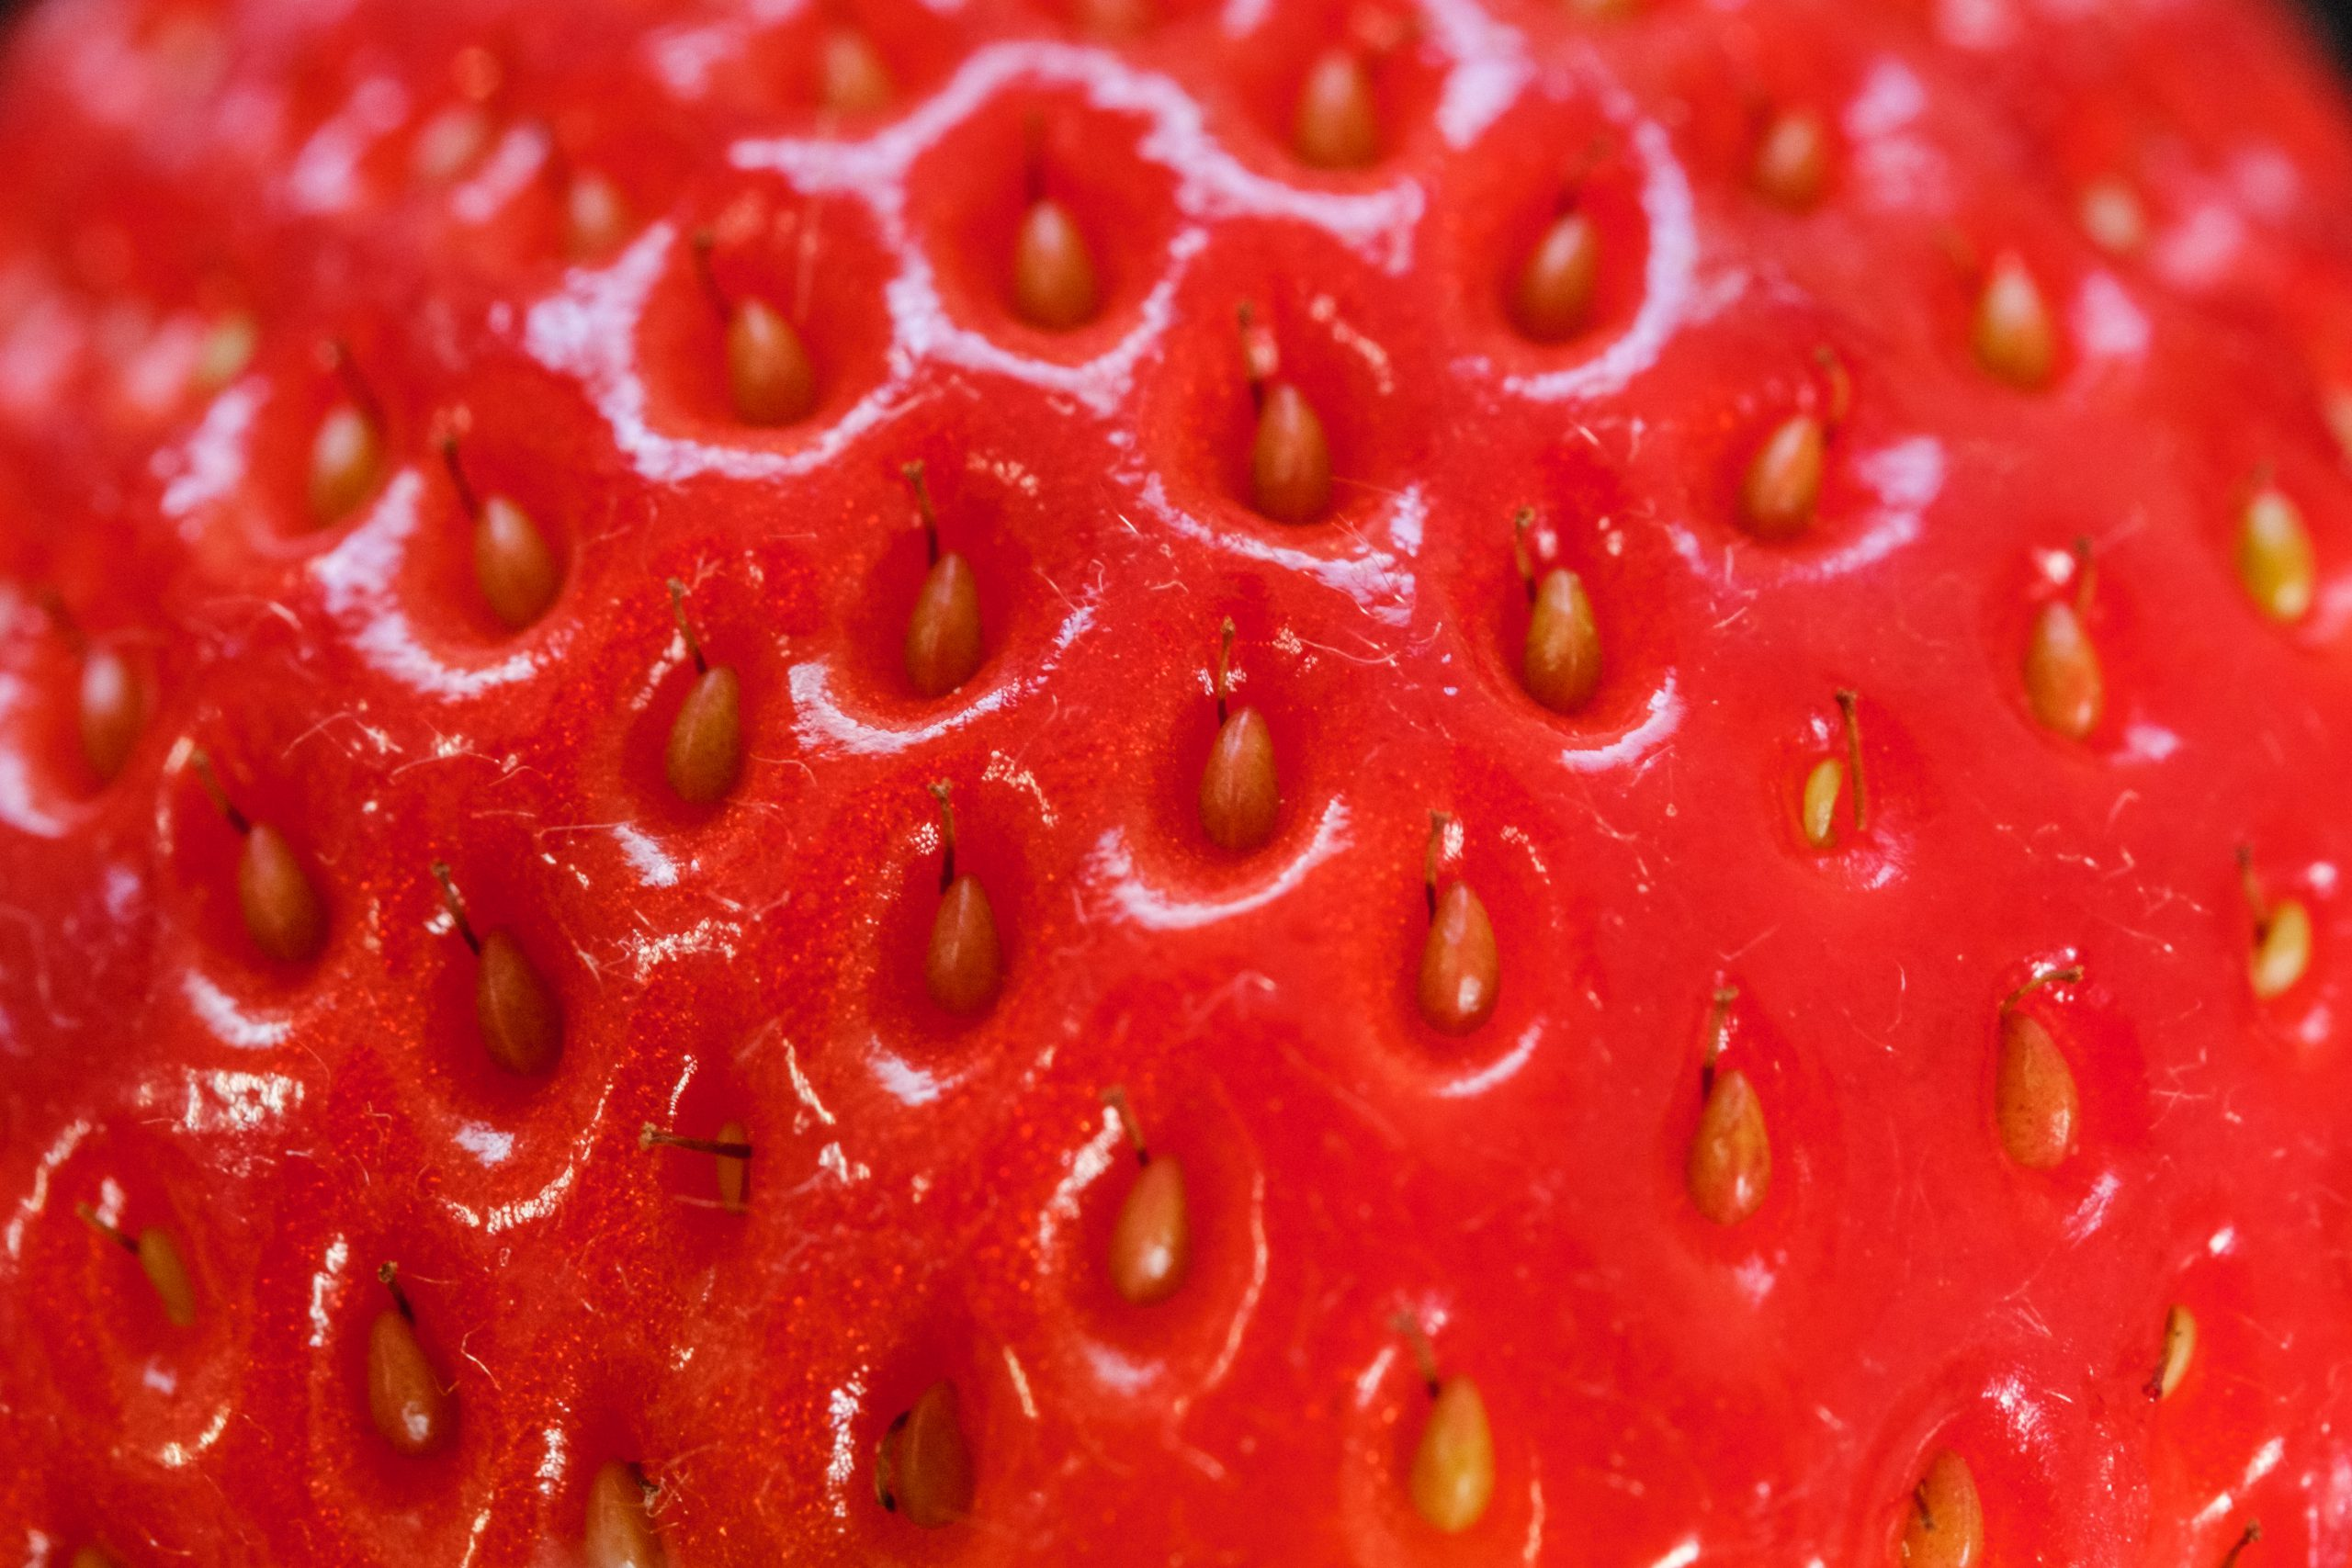 Regarding to MIYOSHI F1 SEED STRAWBERRY Berry Pop supply